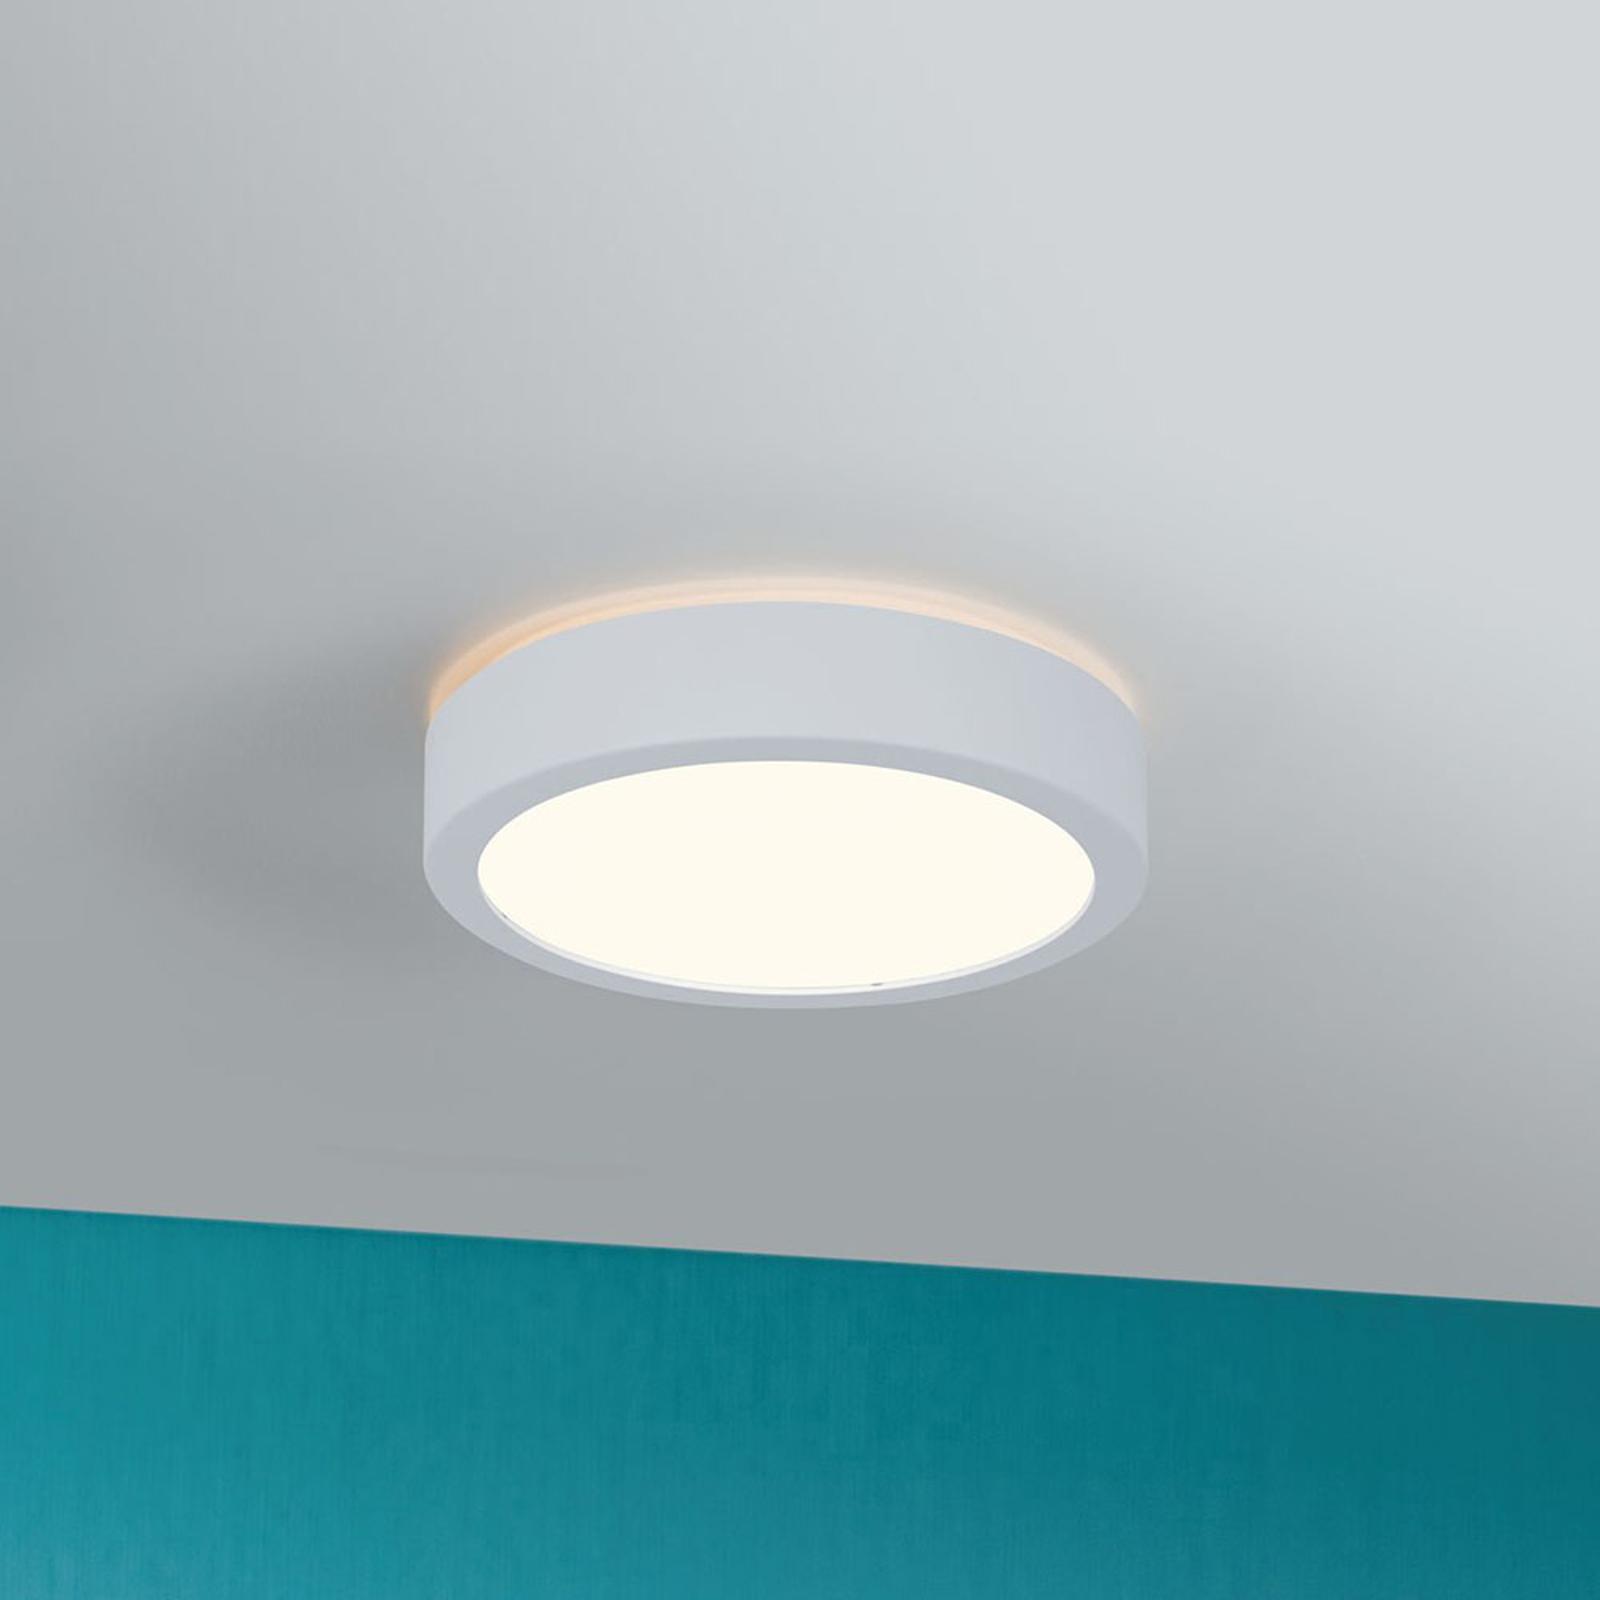 Paulmann Aviar LED plafondlamp Ø 22cm wit 3.000K